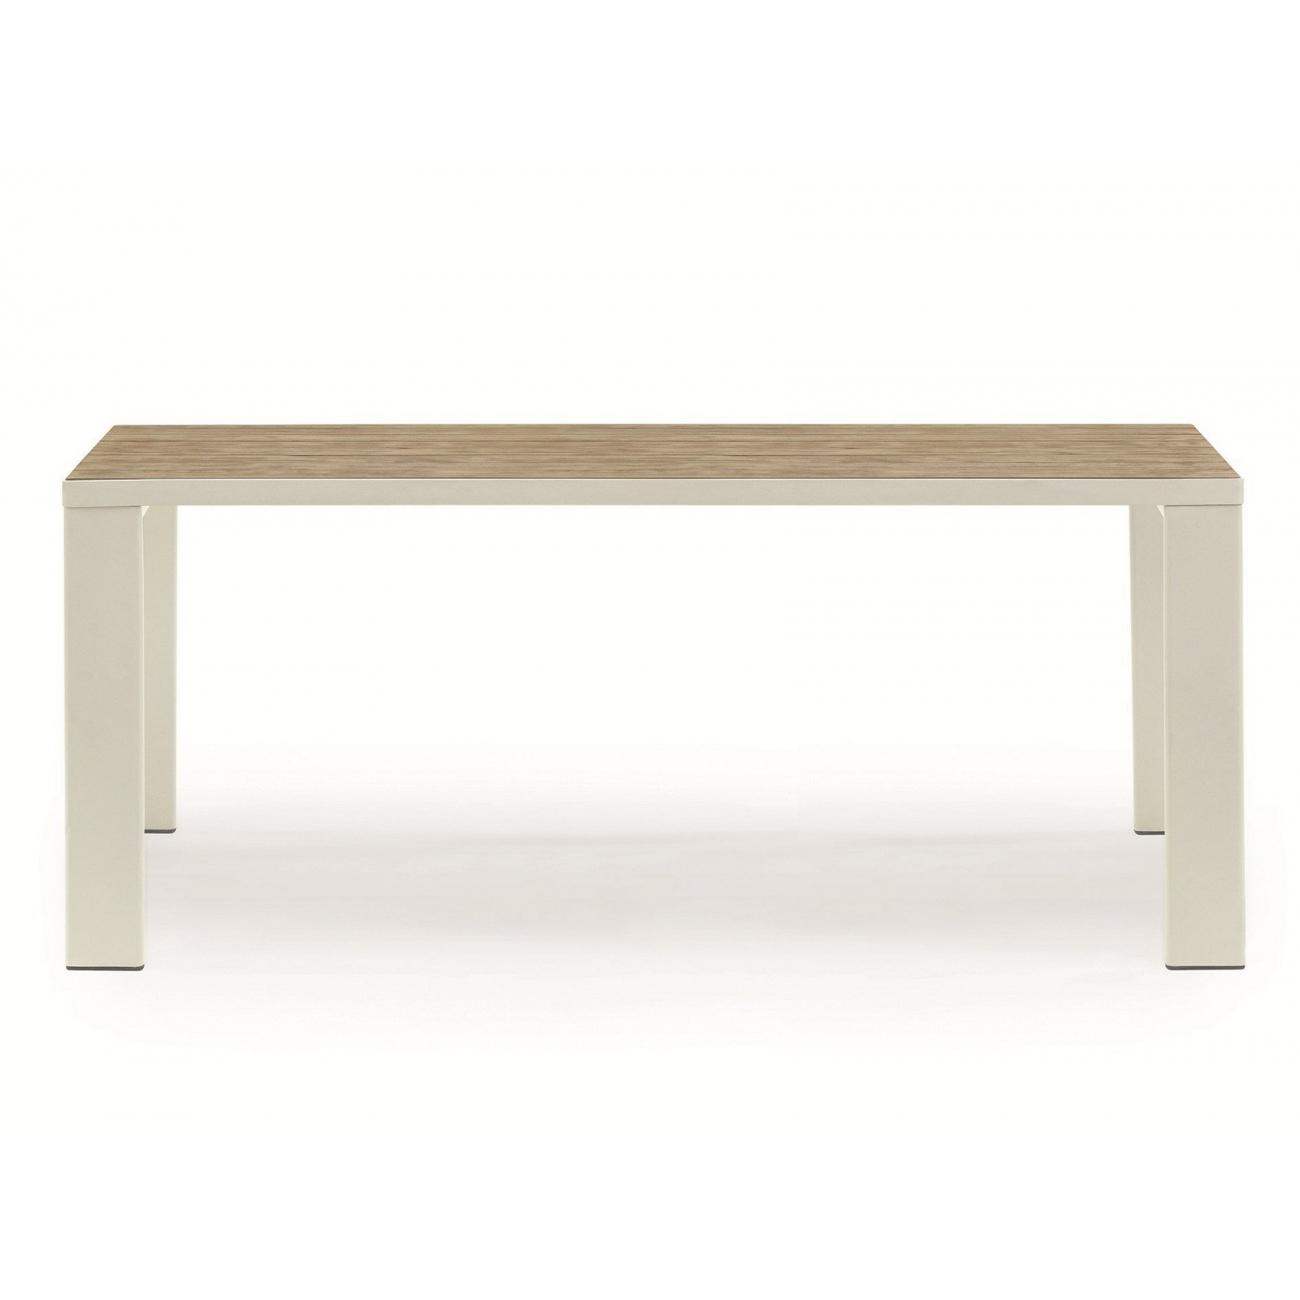 ETHIMO ESEDRA RECTANGULAR TABLE